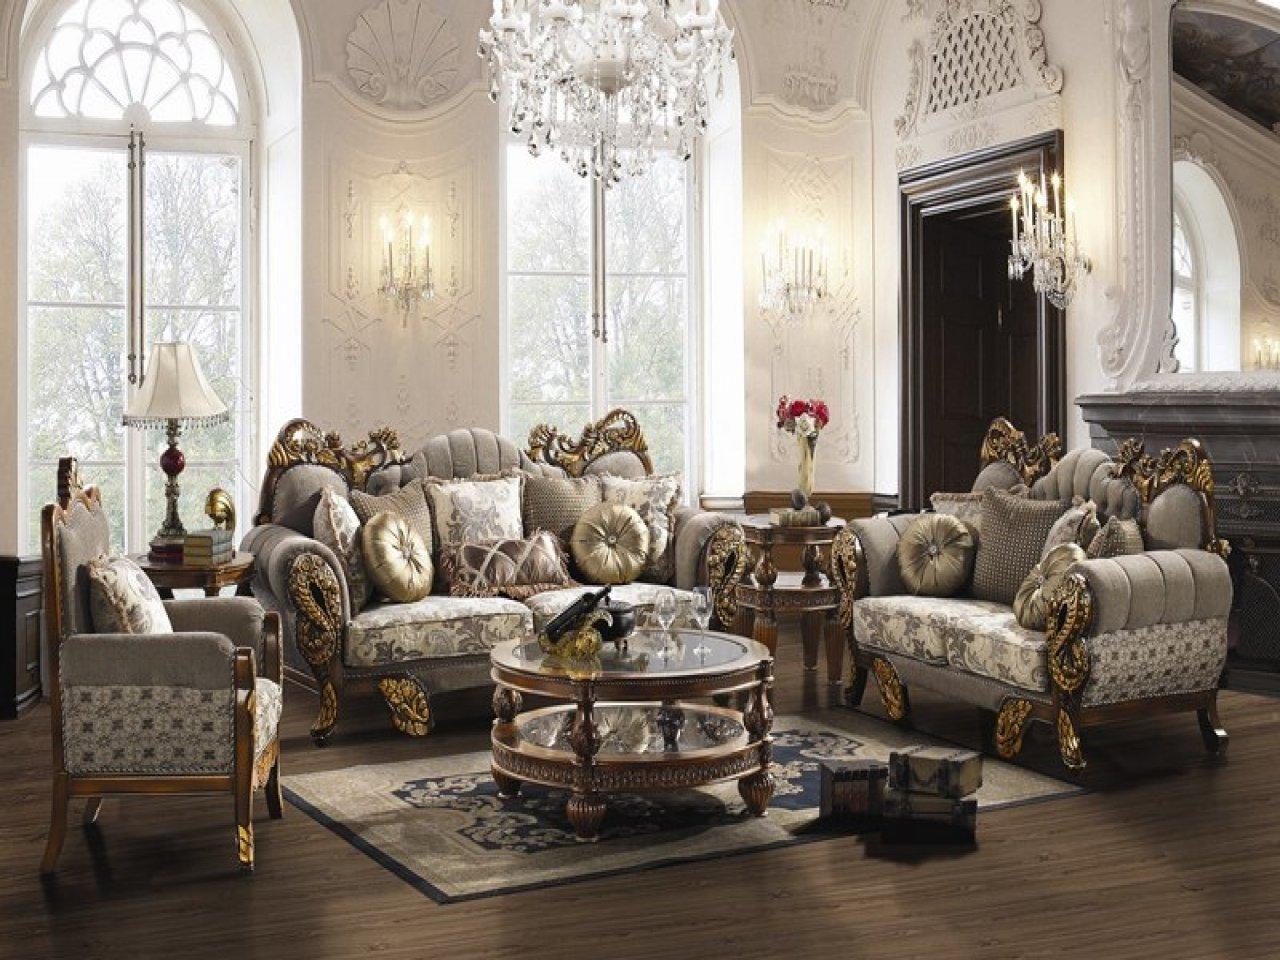 10 Trendy Traditional Living Room Furniture Ideas seat traditional living room furniture classic and elegant 2020